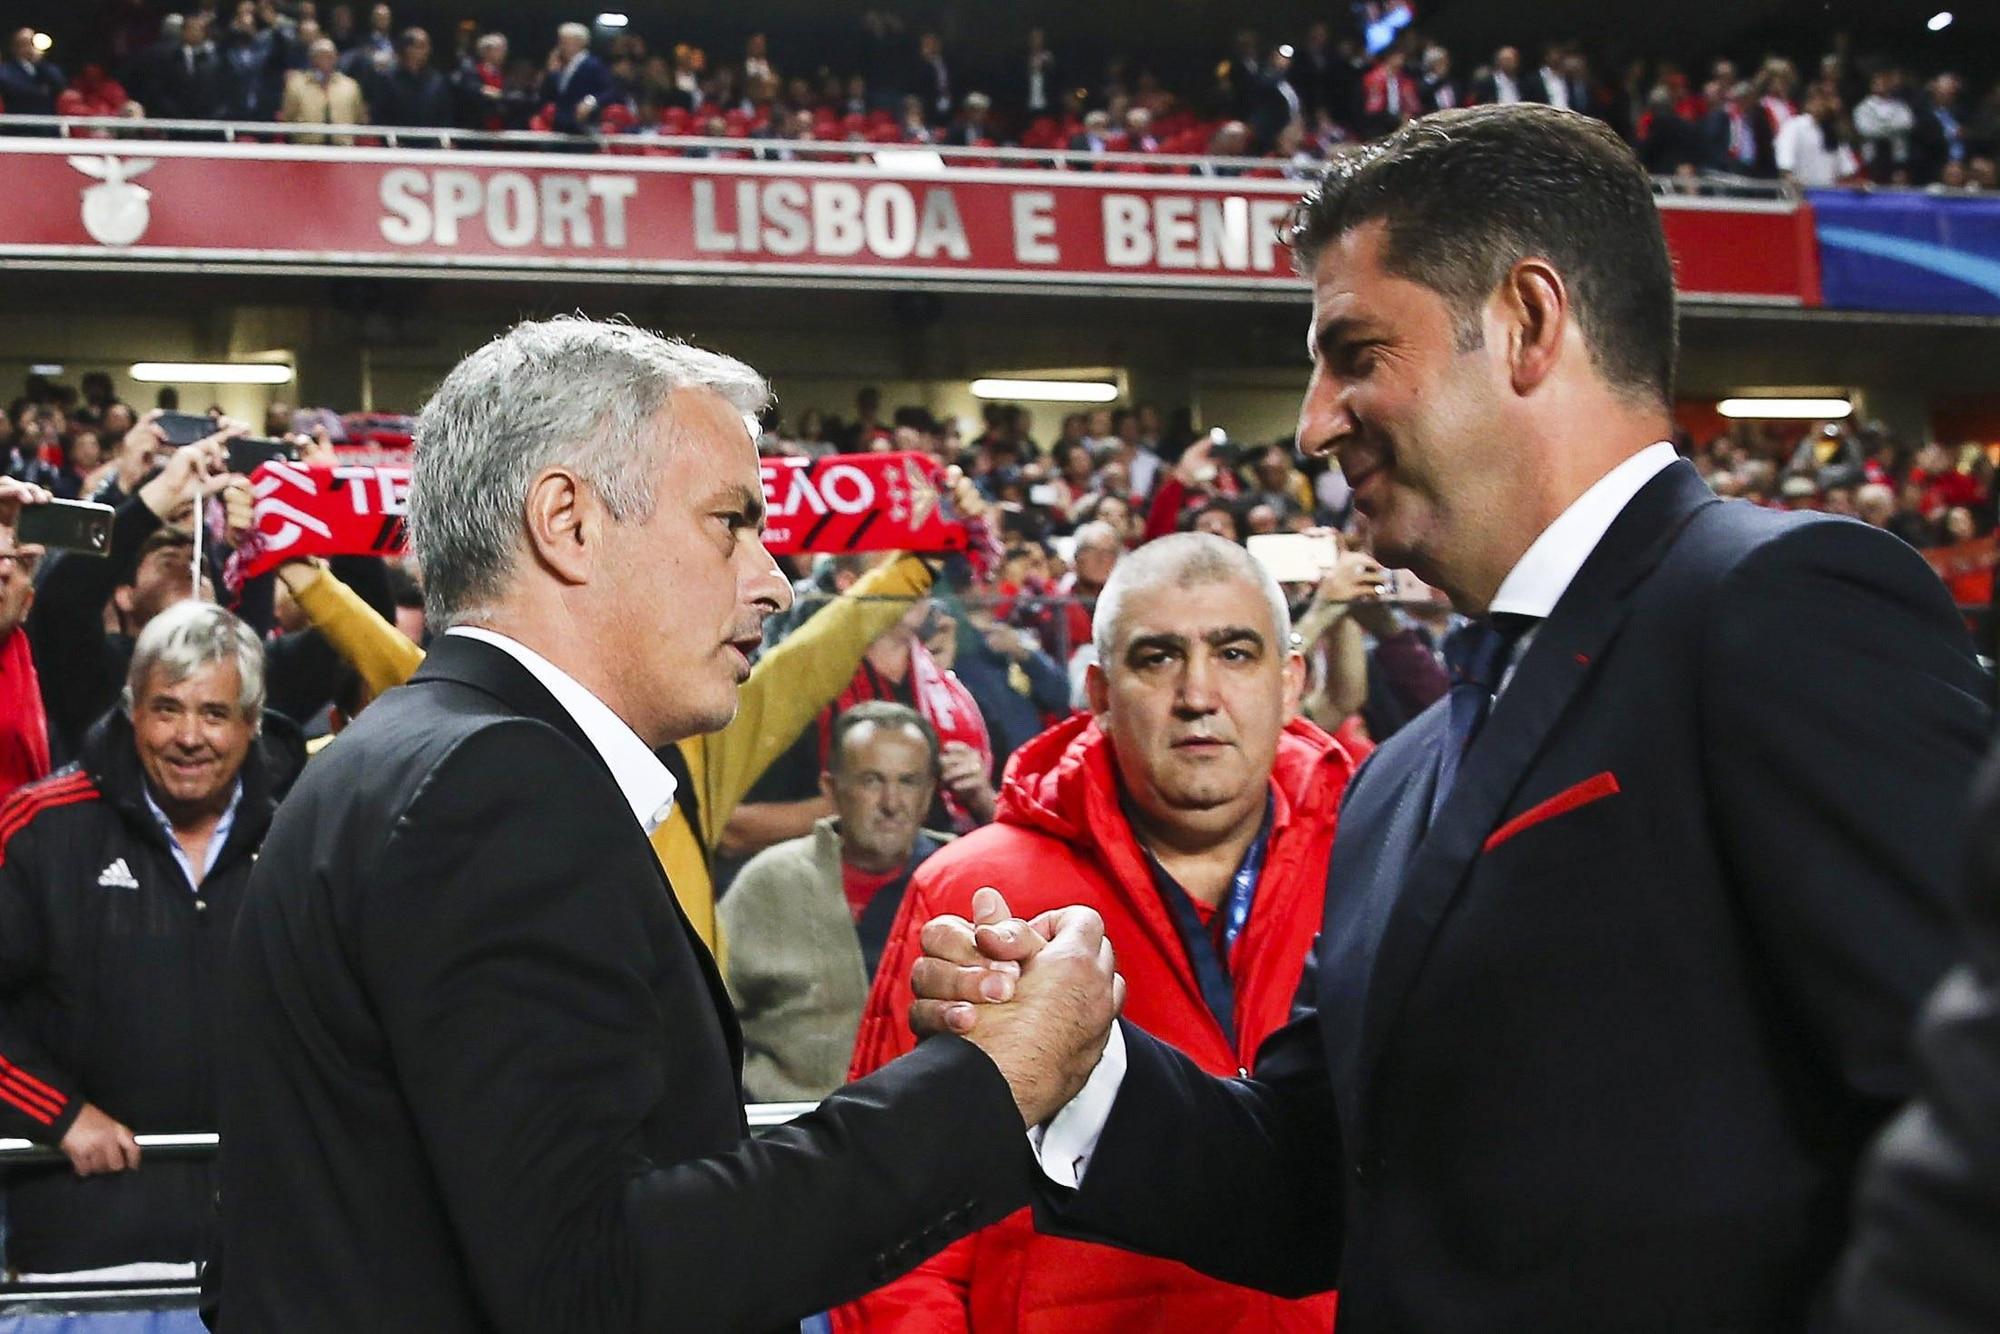 Dal Benfica al Tottenham: ecco tutti i risultati dei derby vissuti da Mourinho